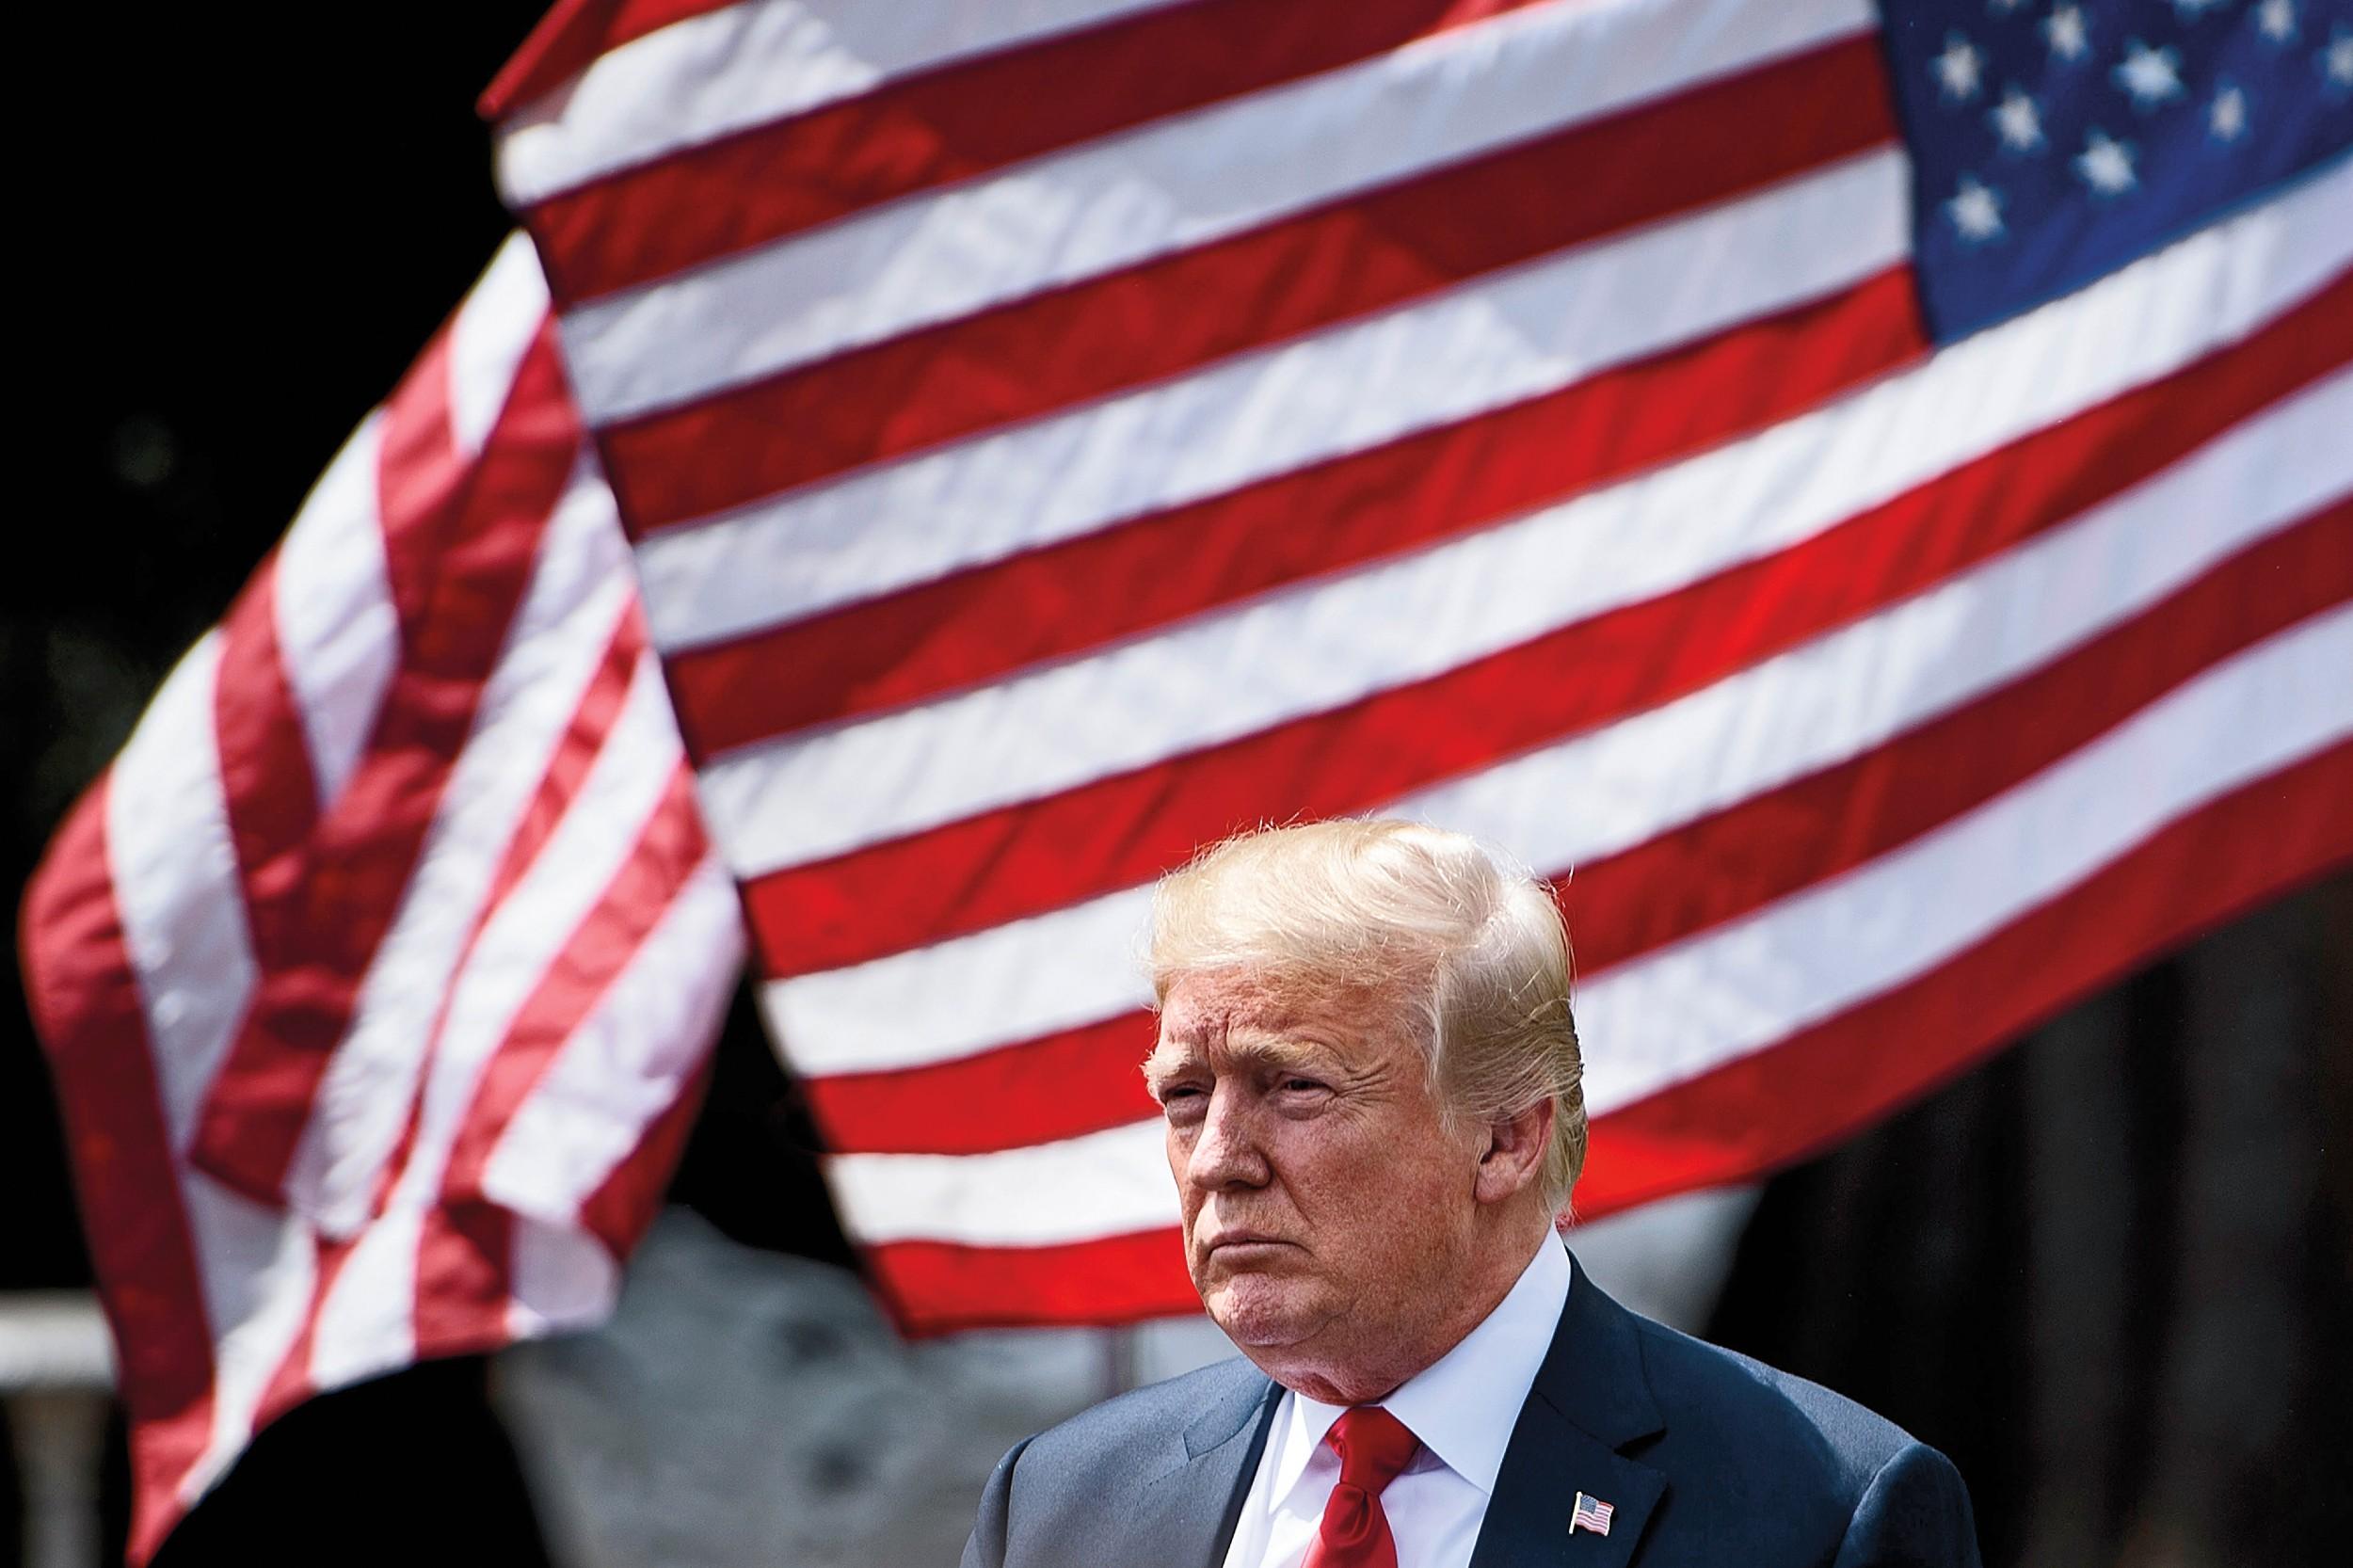 Zamišljeni Donald Tramp ispred američkih zastava (Foto: Brendan Smialowski/AFP/Getty Images)